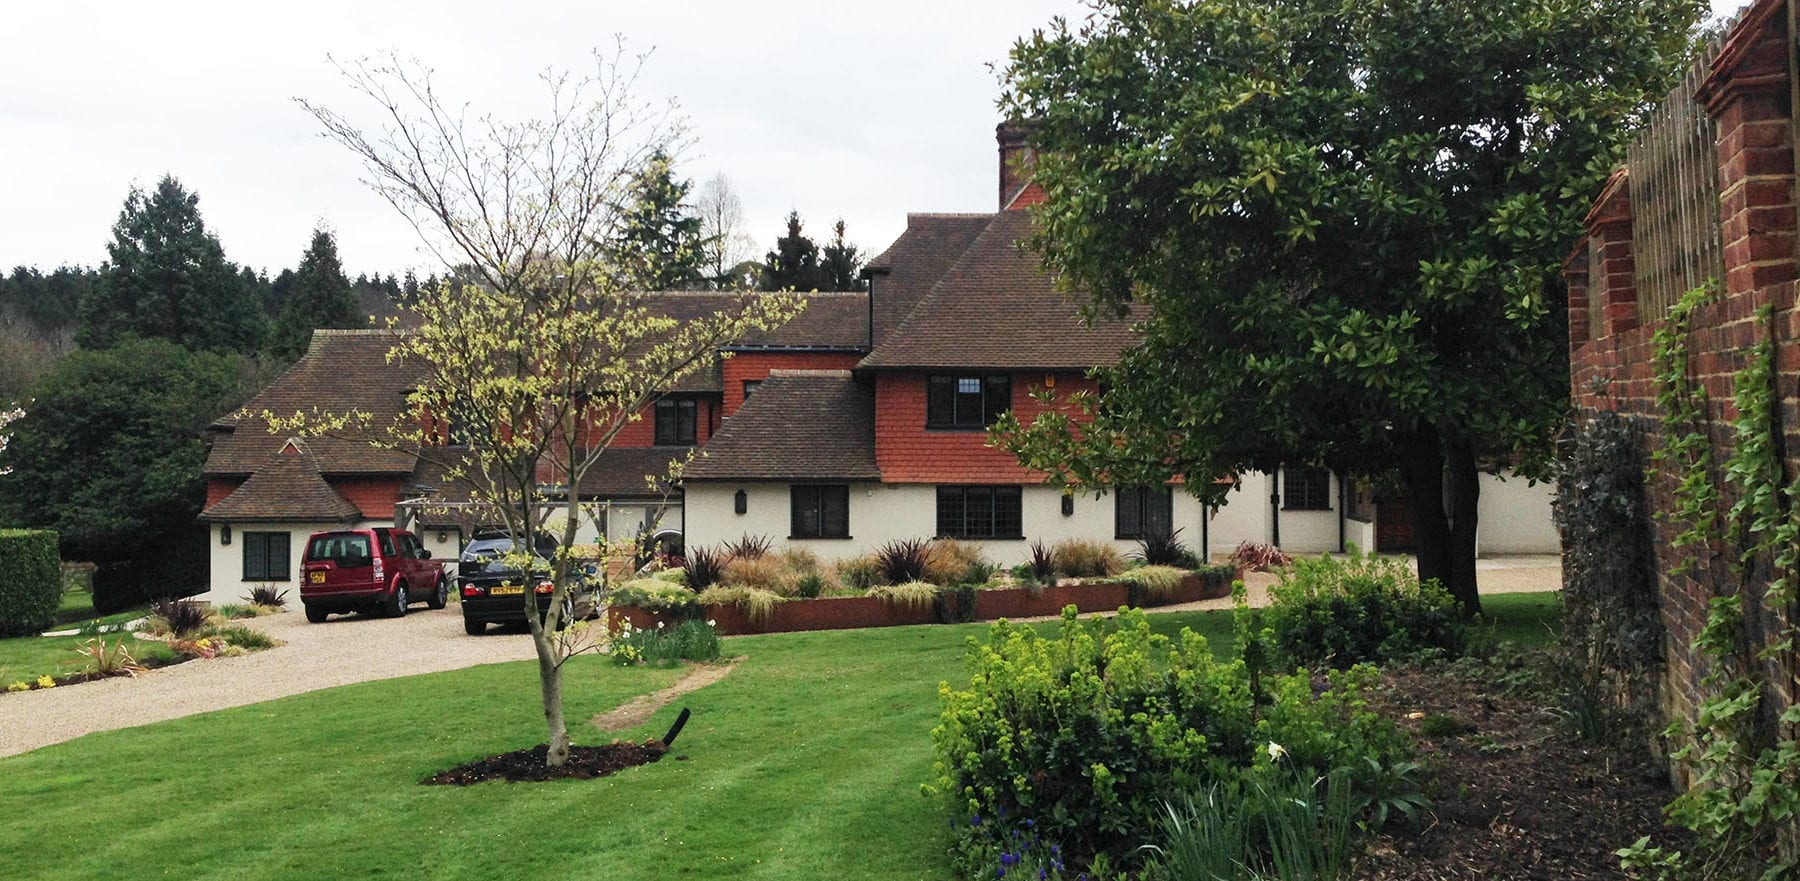 Lifestiles - Handmade Restoration Clay Roof Tiles - Dorking, England 2